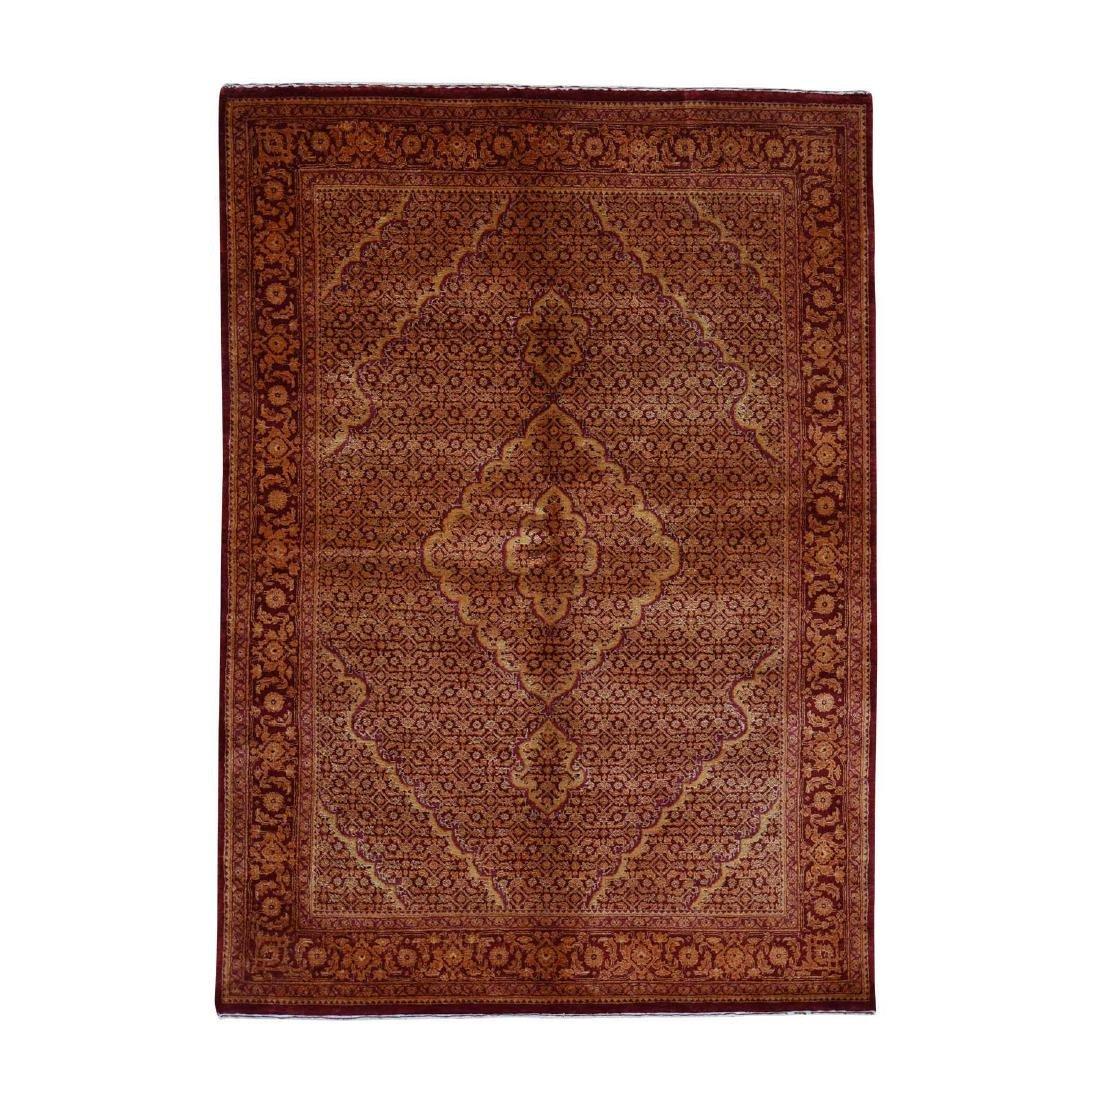 Wool and Silk Tone on Tone Tabriz Mahi Hand Knotted